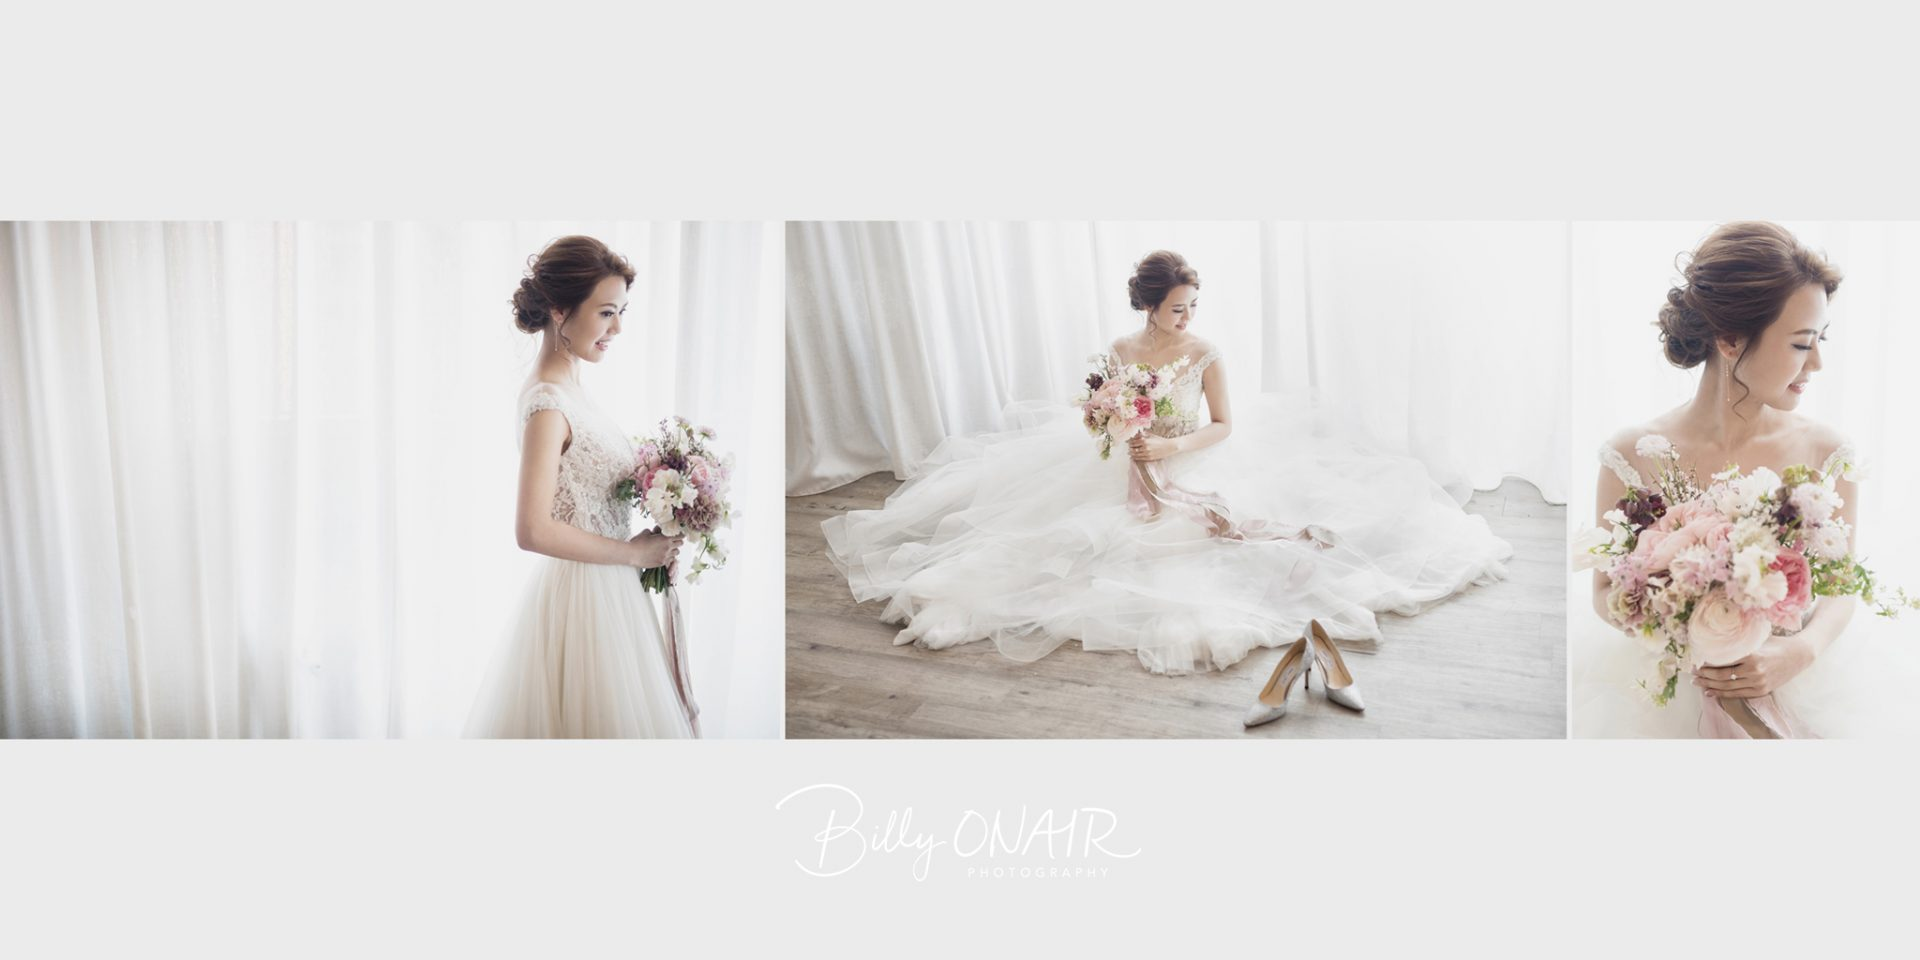 hk_pre_wedding_09